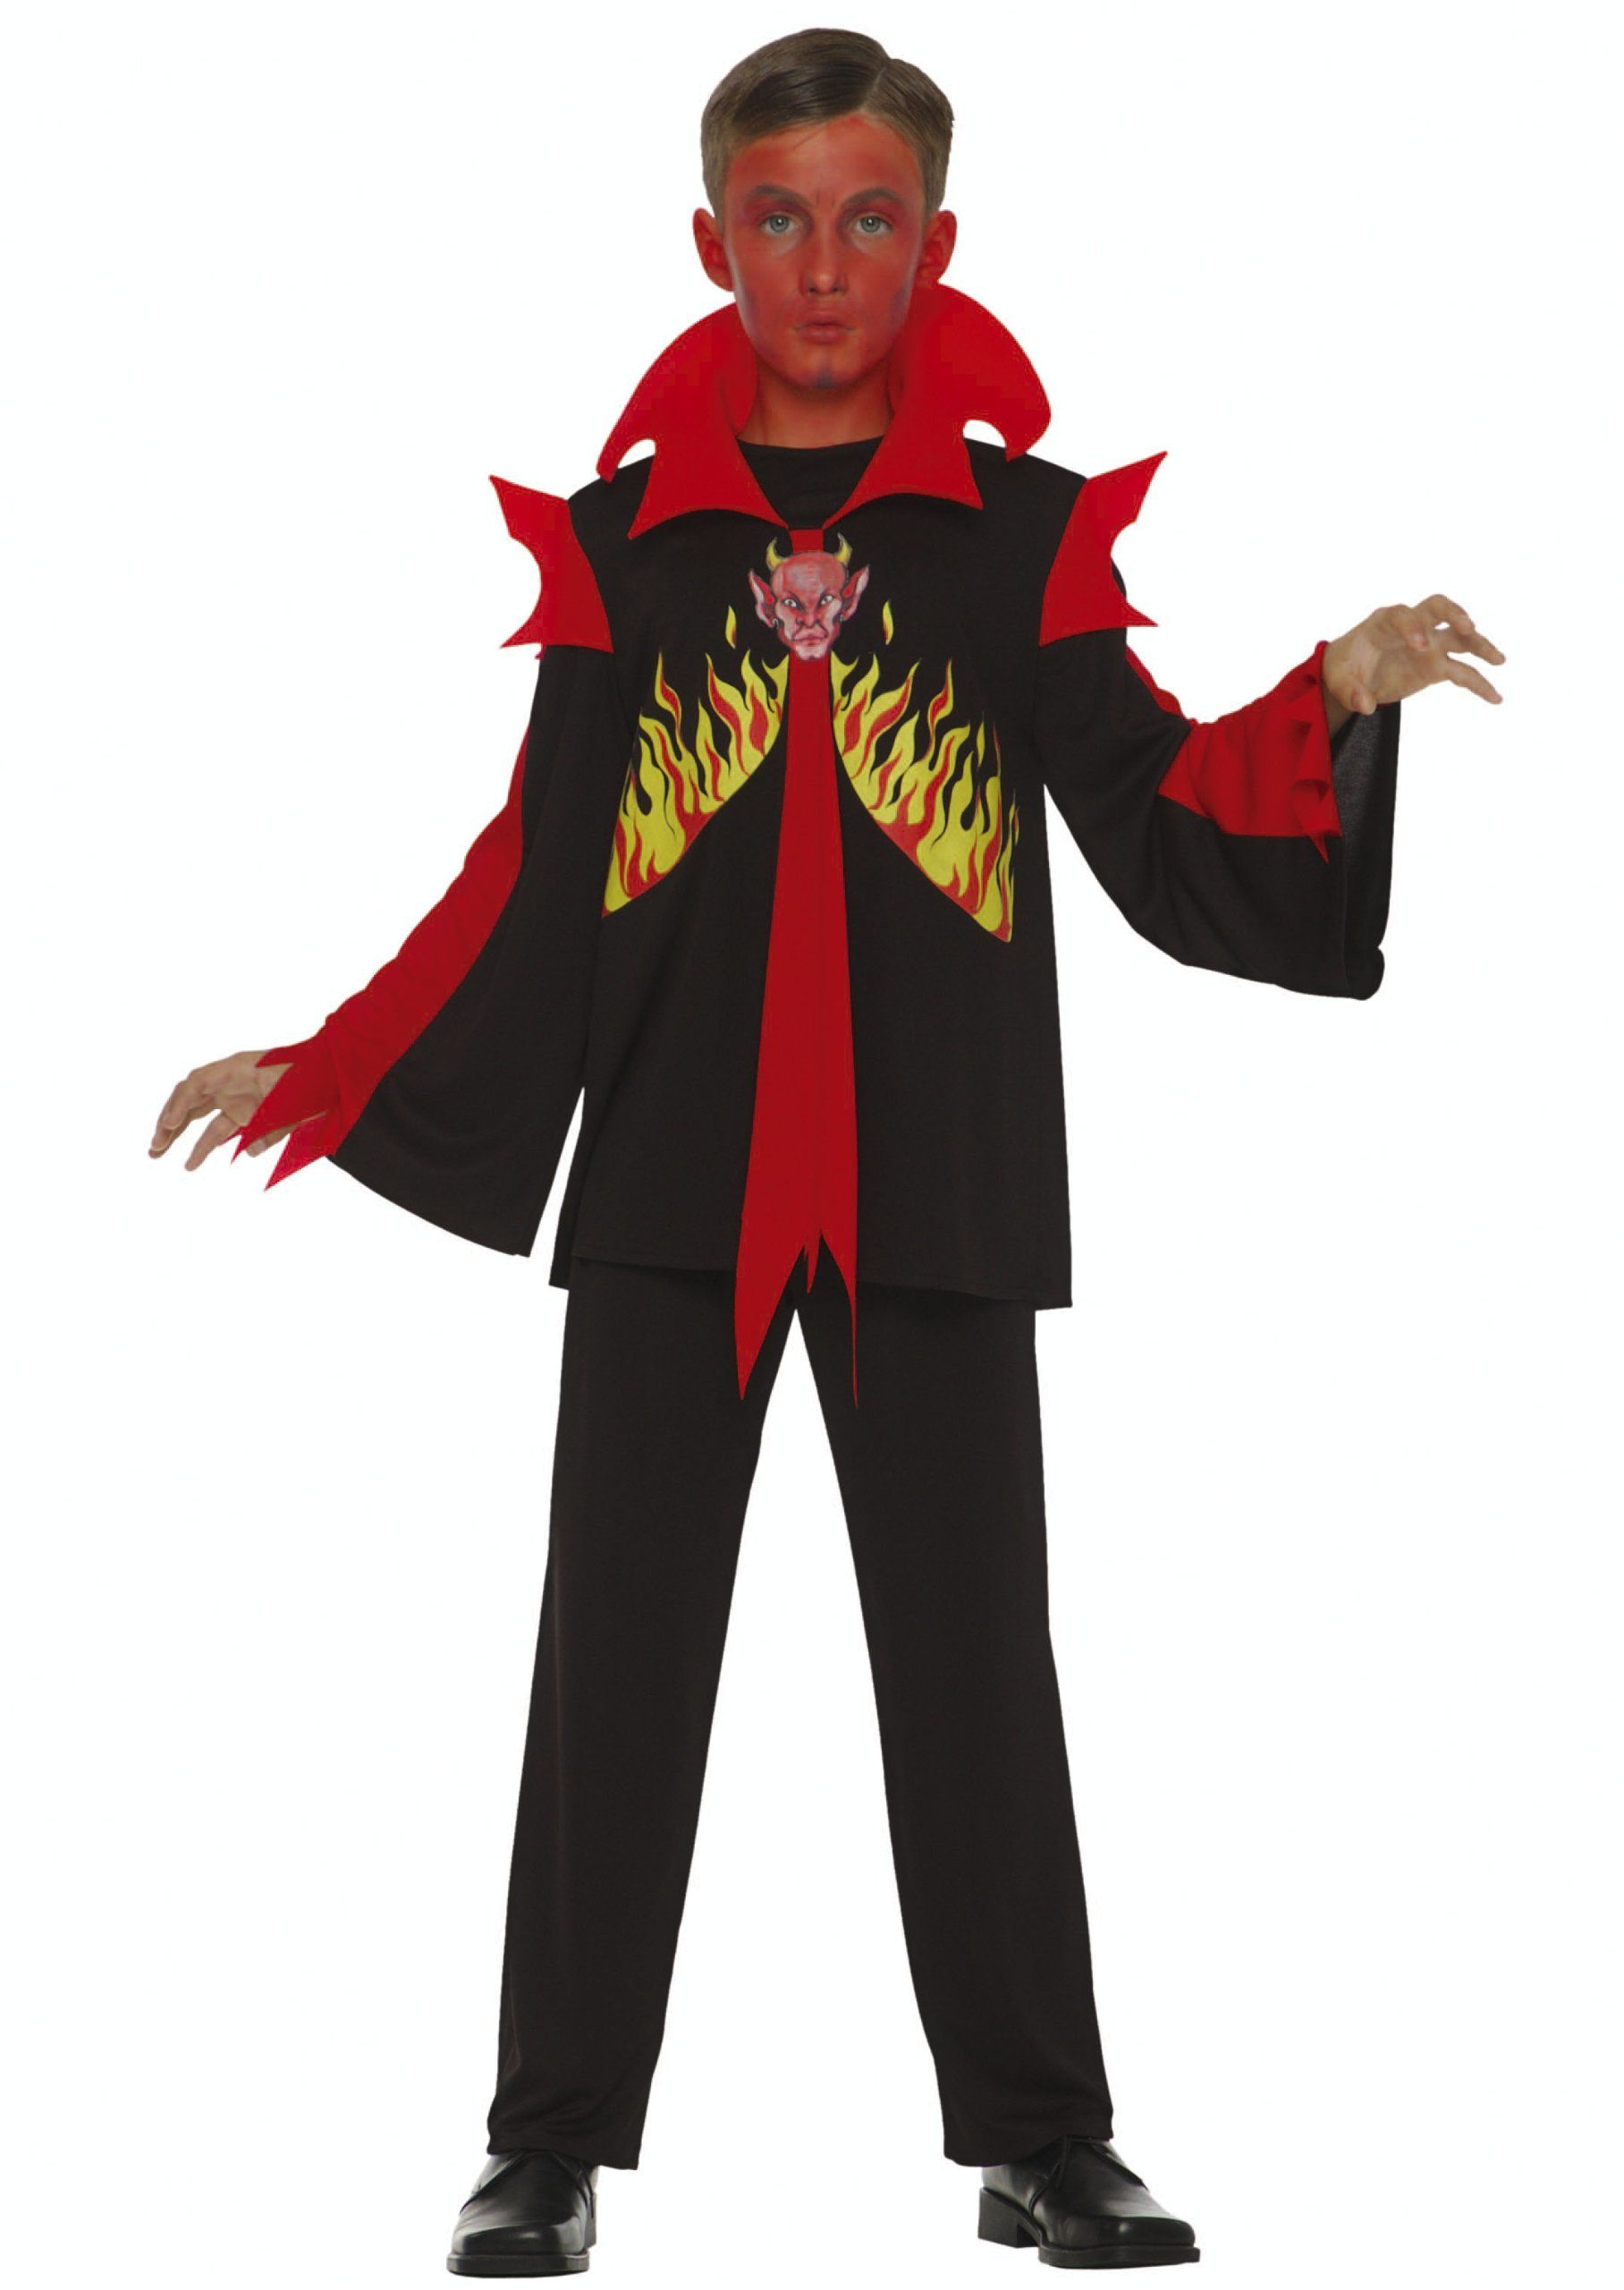 Cesar  G732  001  kostium  diabeł ze światłem